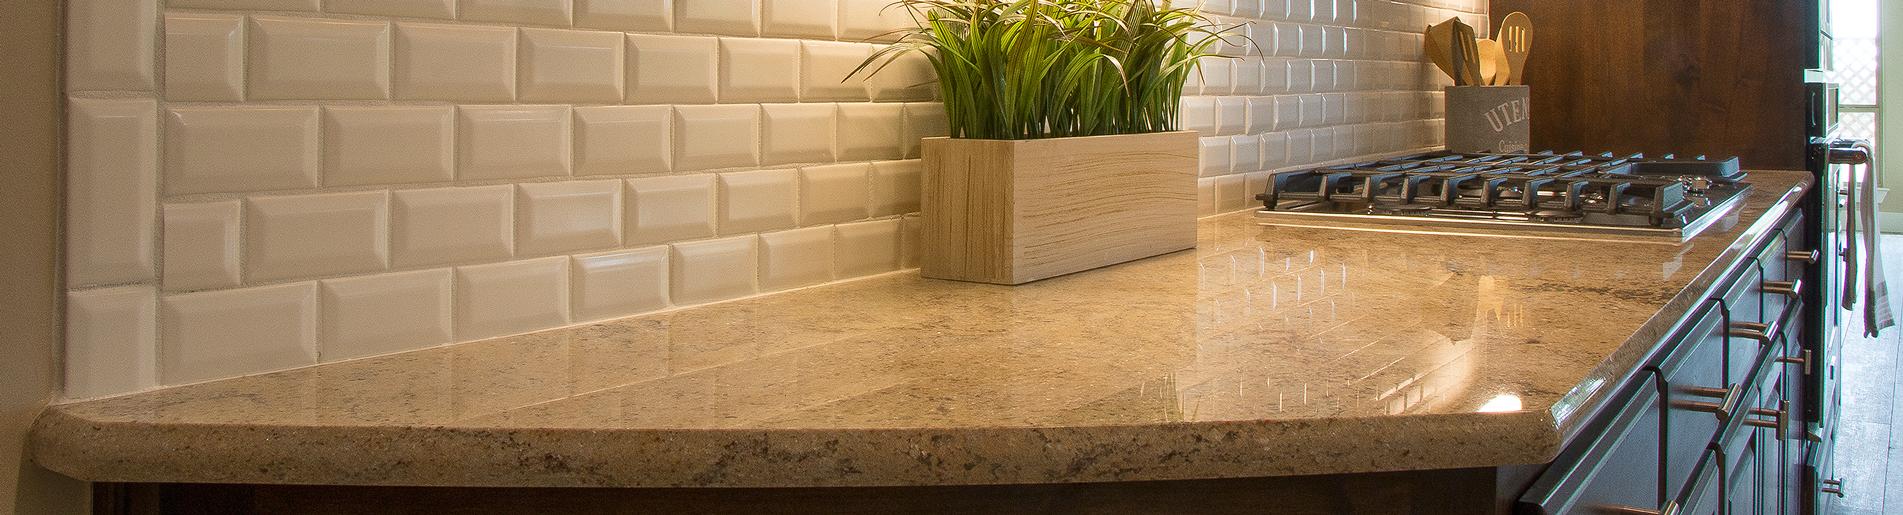 41-sta-granite-bathroom-cambria-c